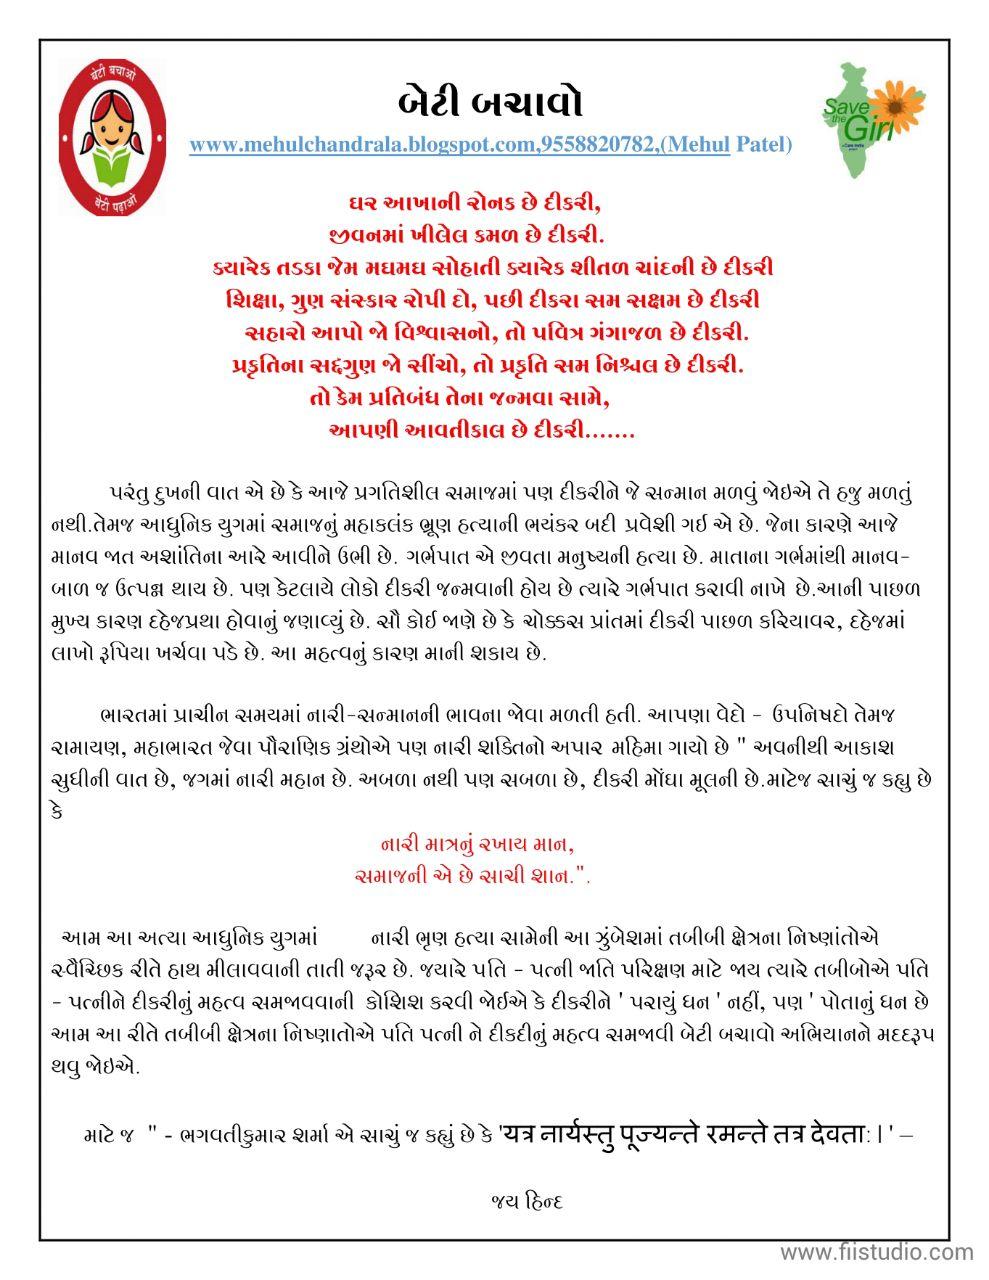 saftey essay in hindi gujarati How to write essay in gujarati deepawali essay in hindi 300 words - duration: 2:33 policy & safety send feedback.